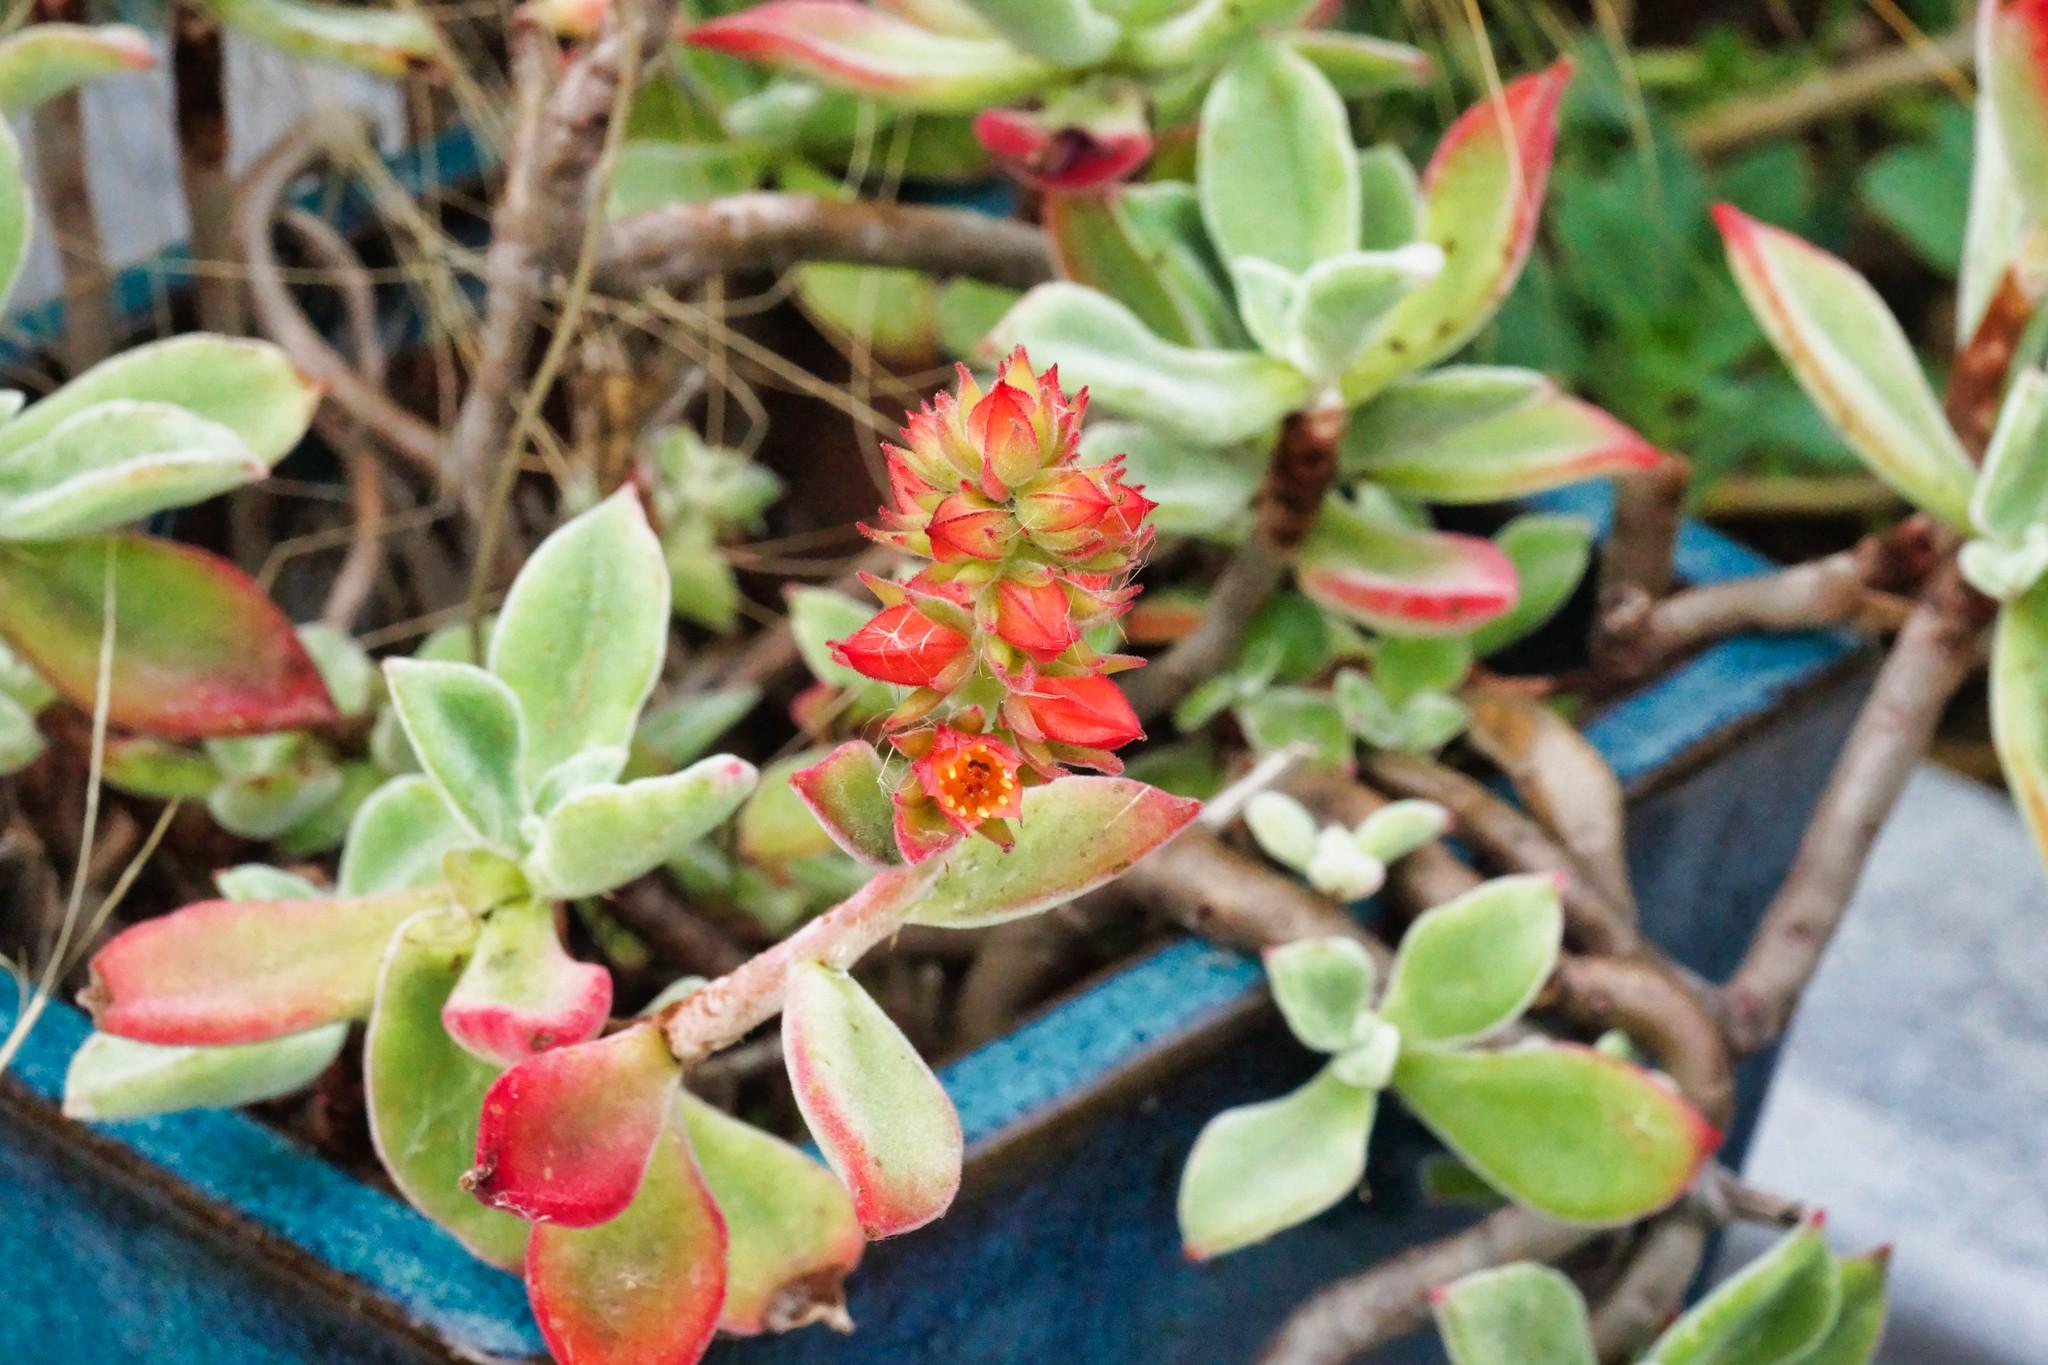 2019-02-01 - Nature Photography - Succulent - ??????